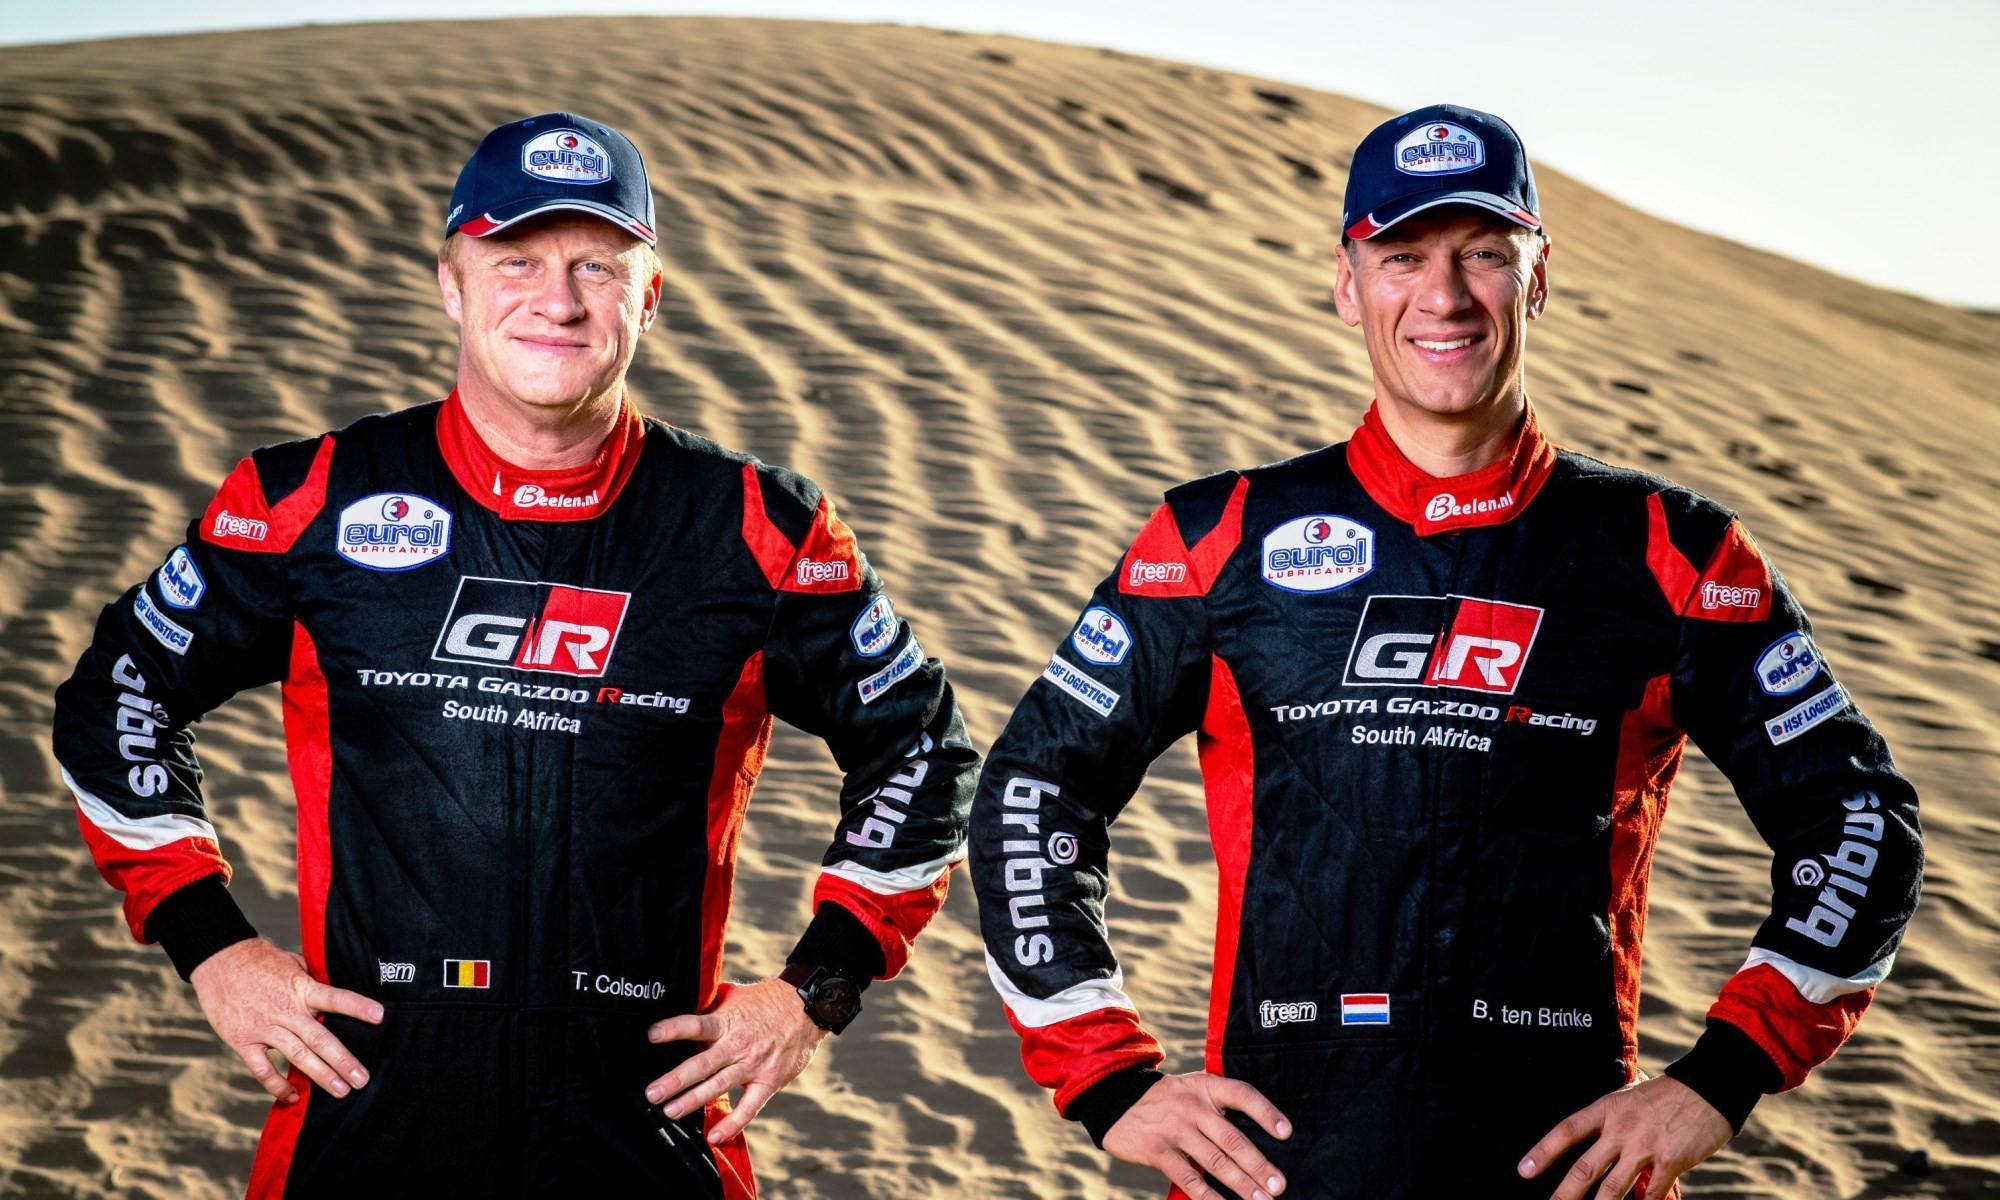 Bernhard Ten Brinke and navigator Tom Colsoul